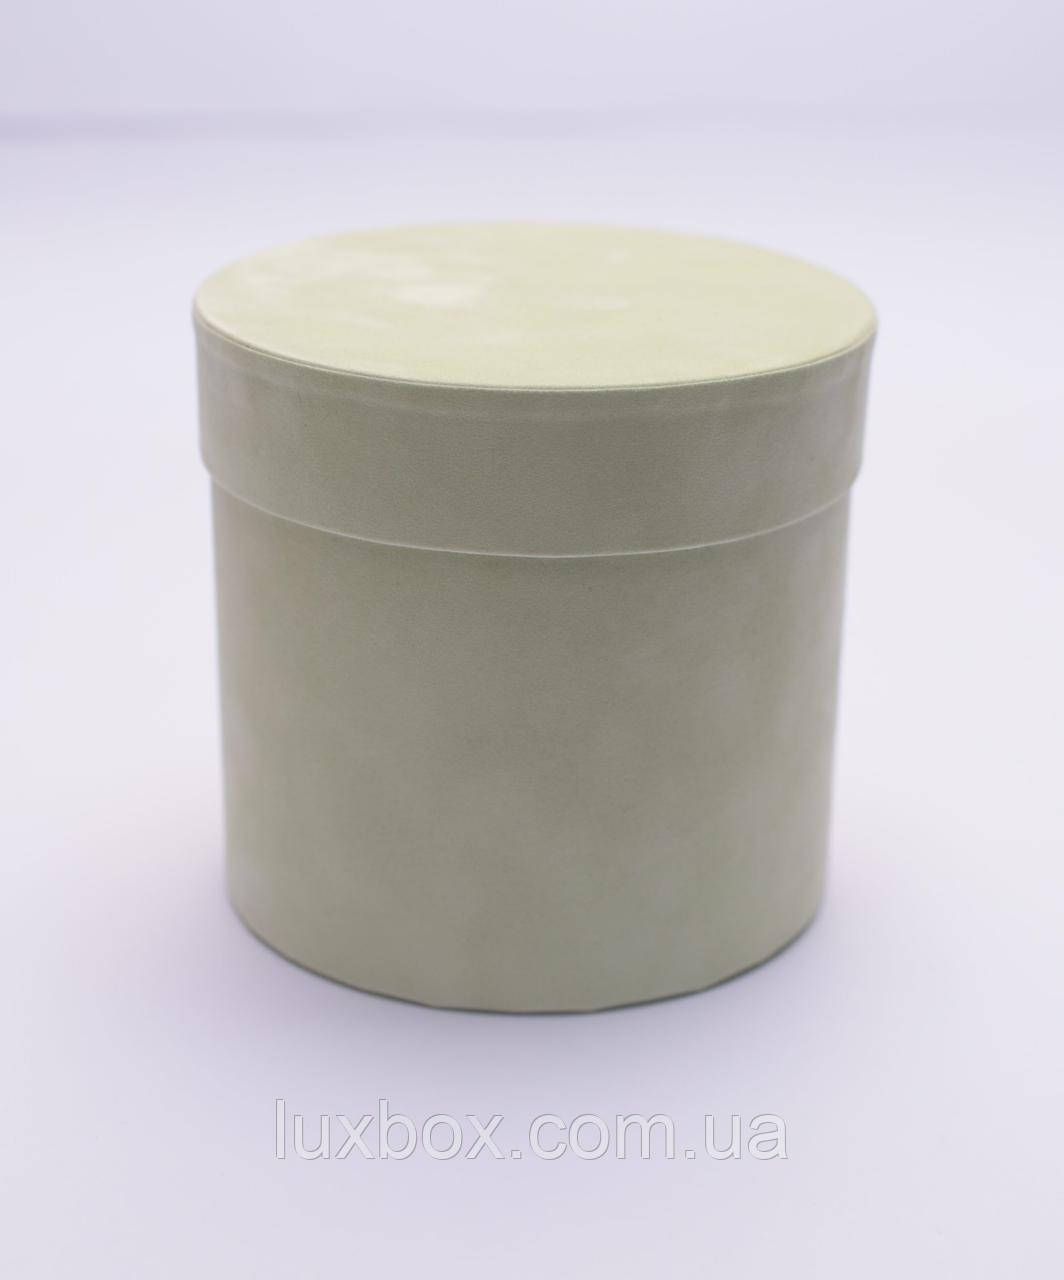 Шляпна коробка ВЕЛЮРОВА(бархатна коробка)h8/d12